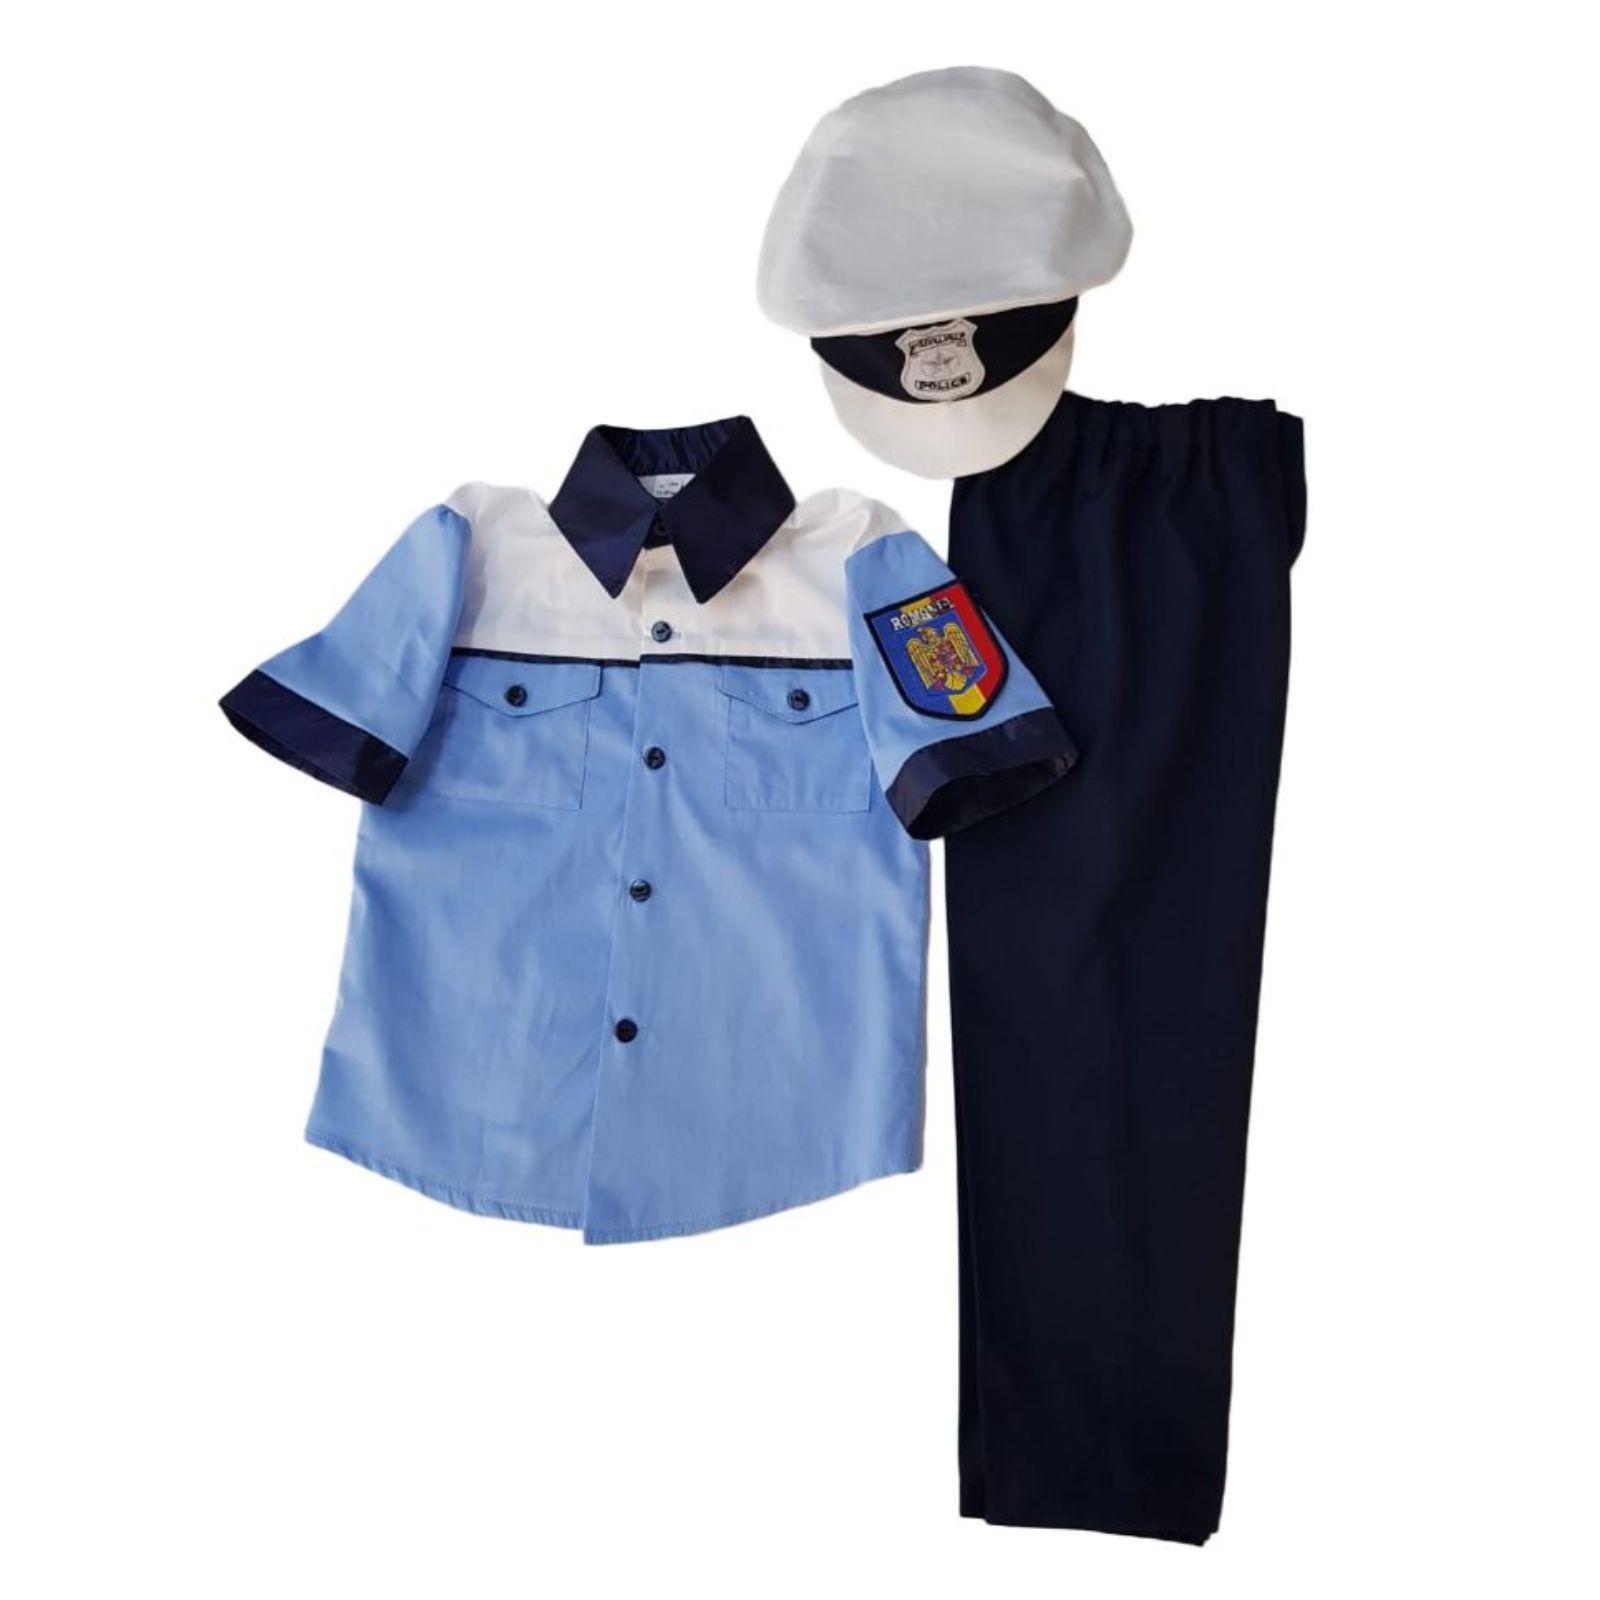 Costum politist copii- sapca bicolora și scris reflectorizant 2